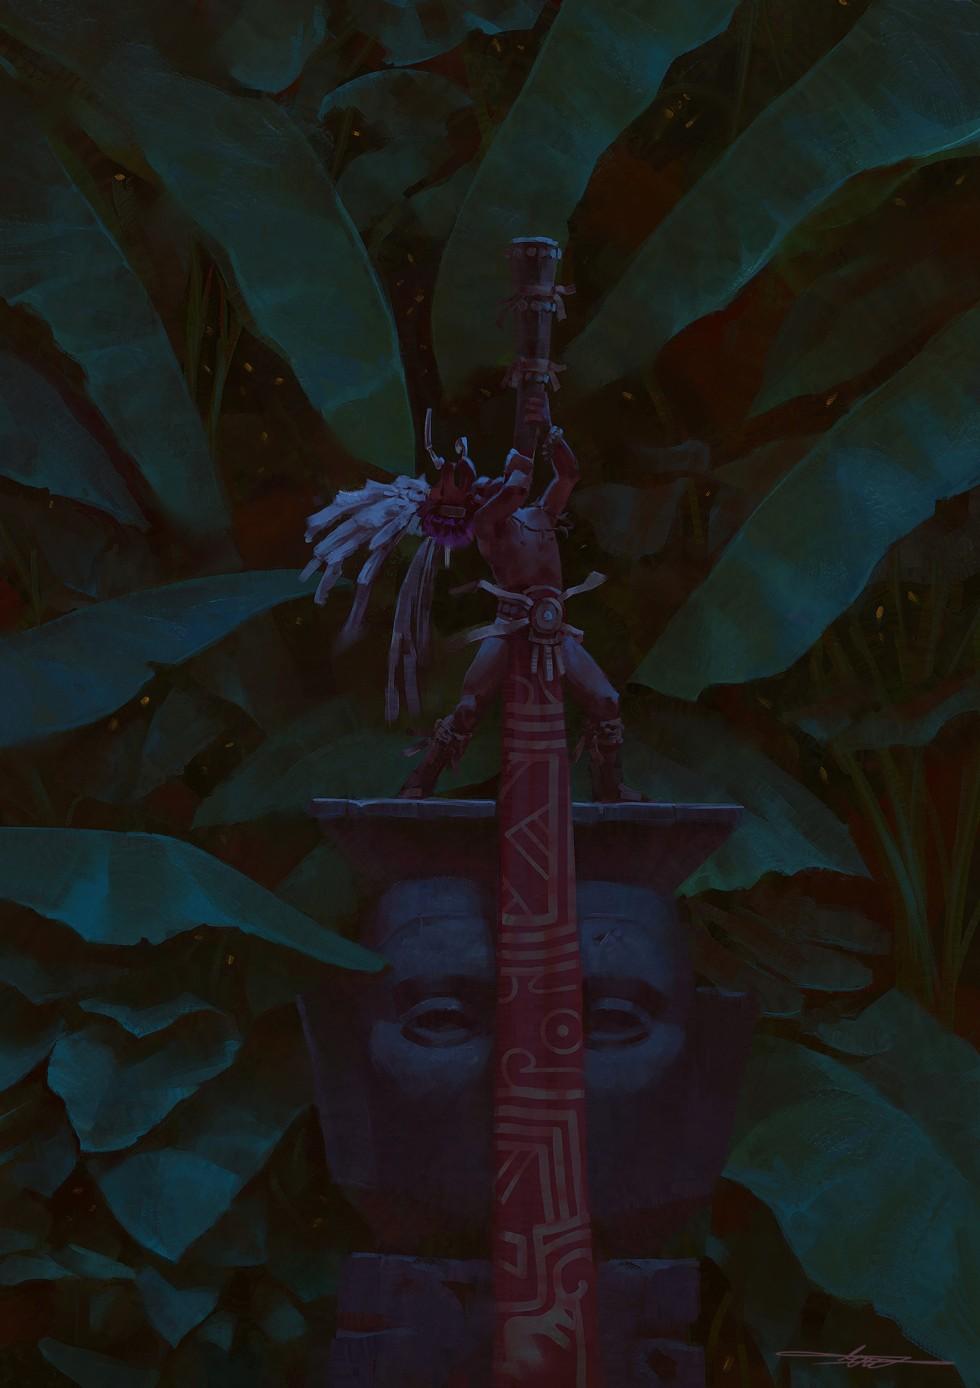 Native man hiding in jungle foliage at night